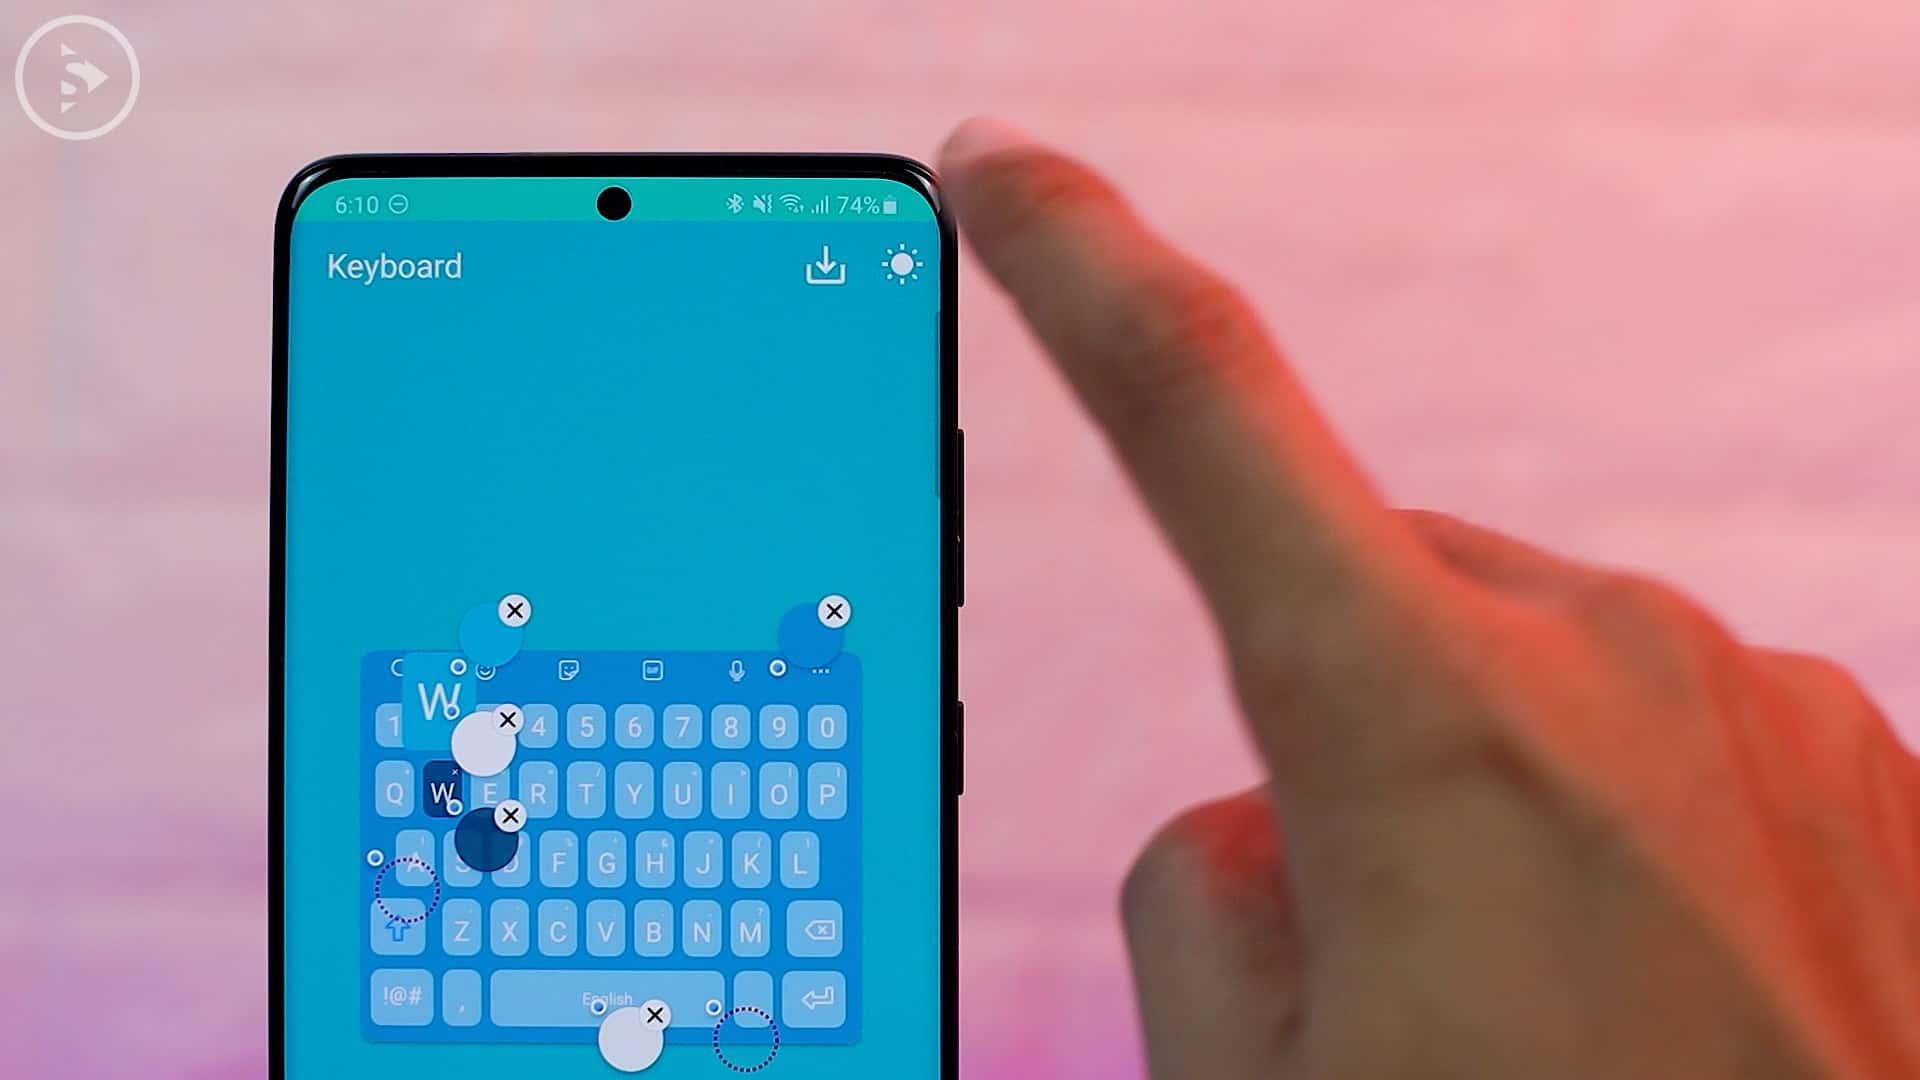 Cara Ganti Warna Keyboard di HP Samsung - Fitur Baru Good Lock - Icon Matahari